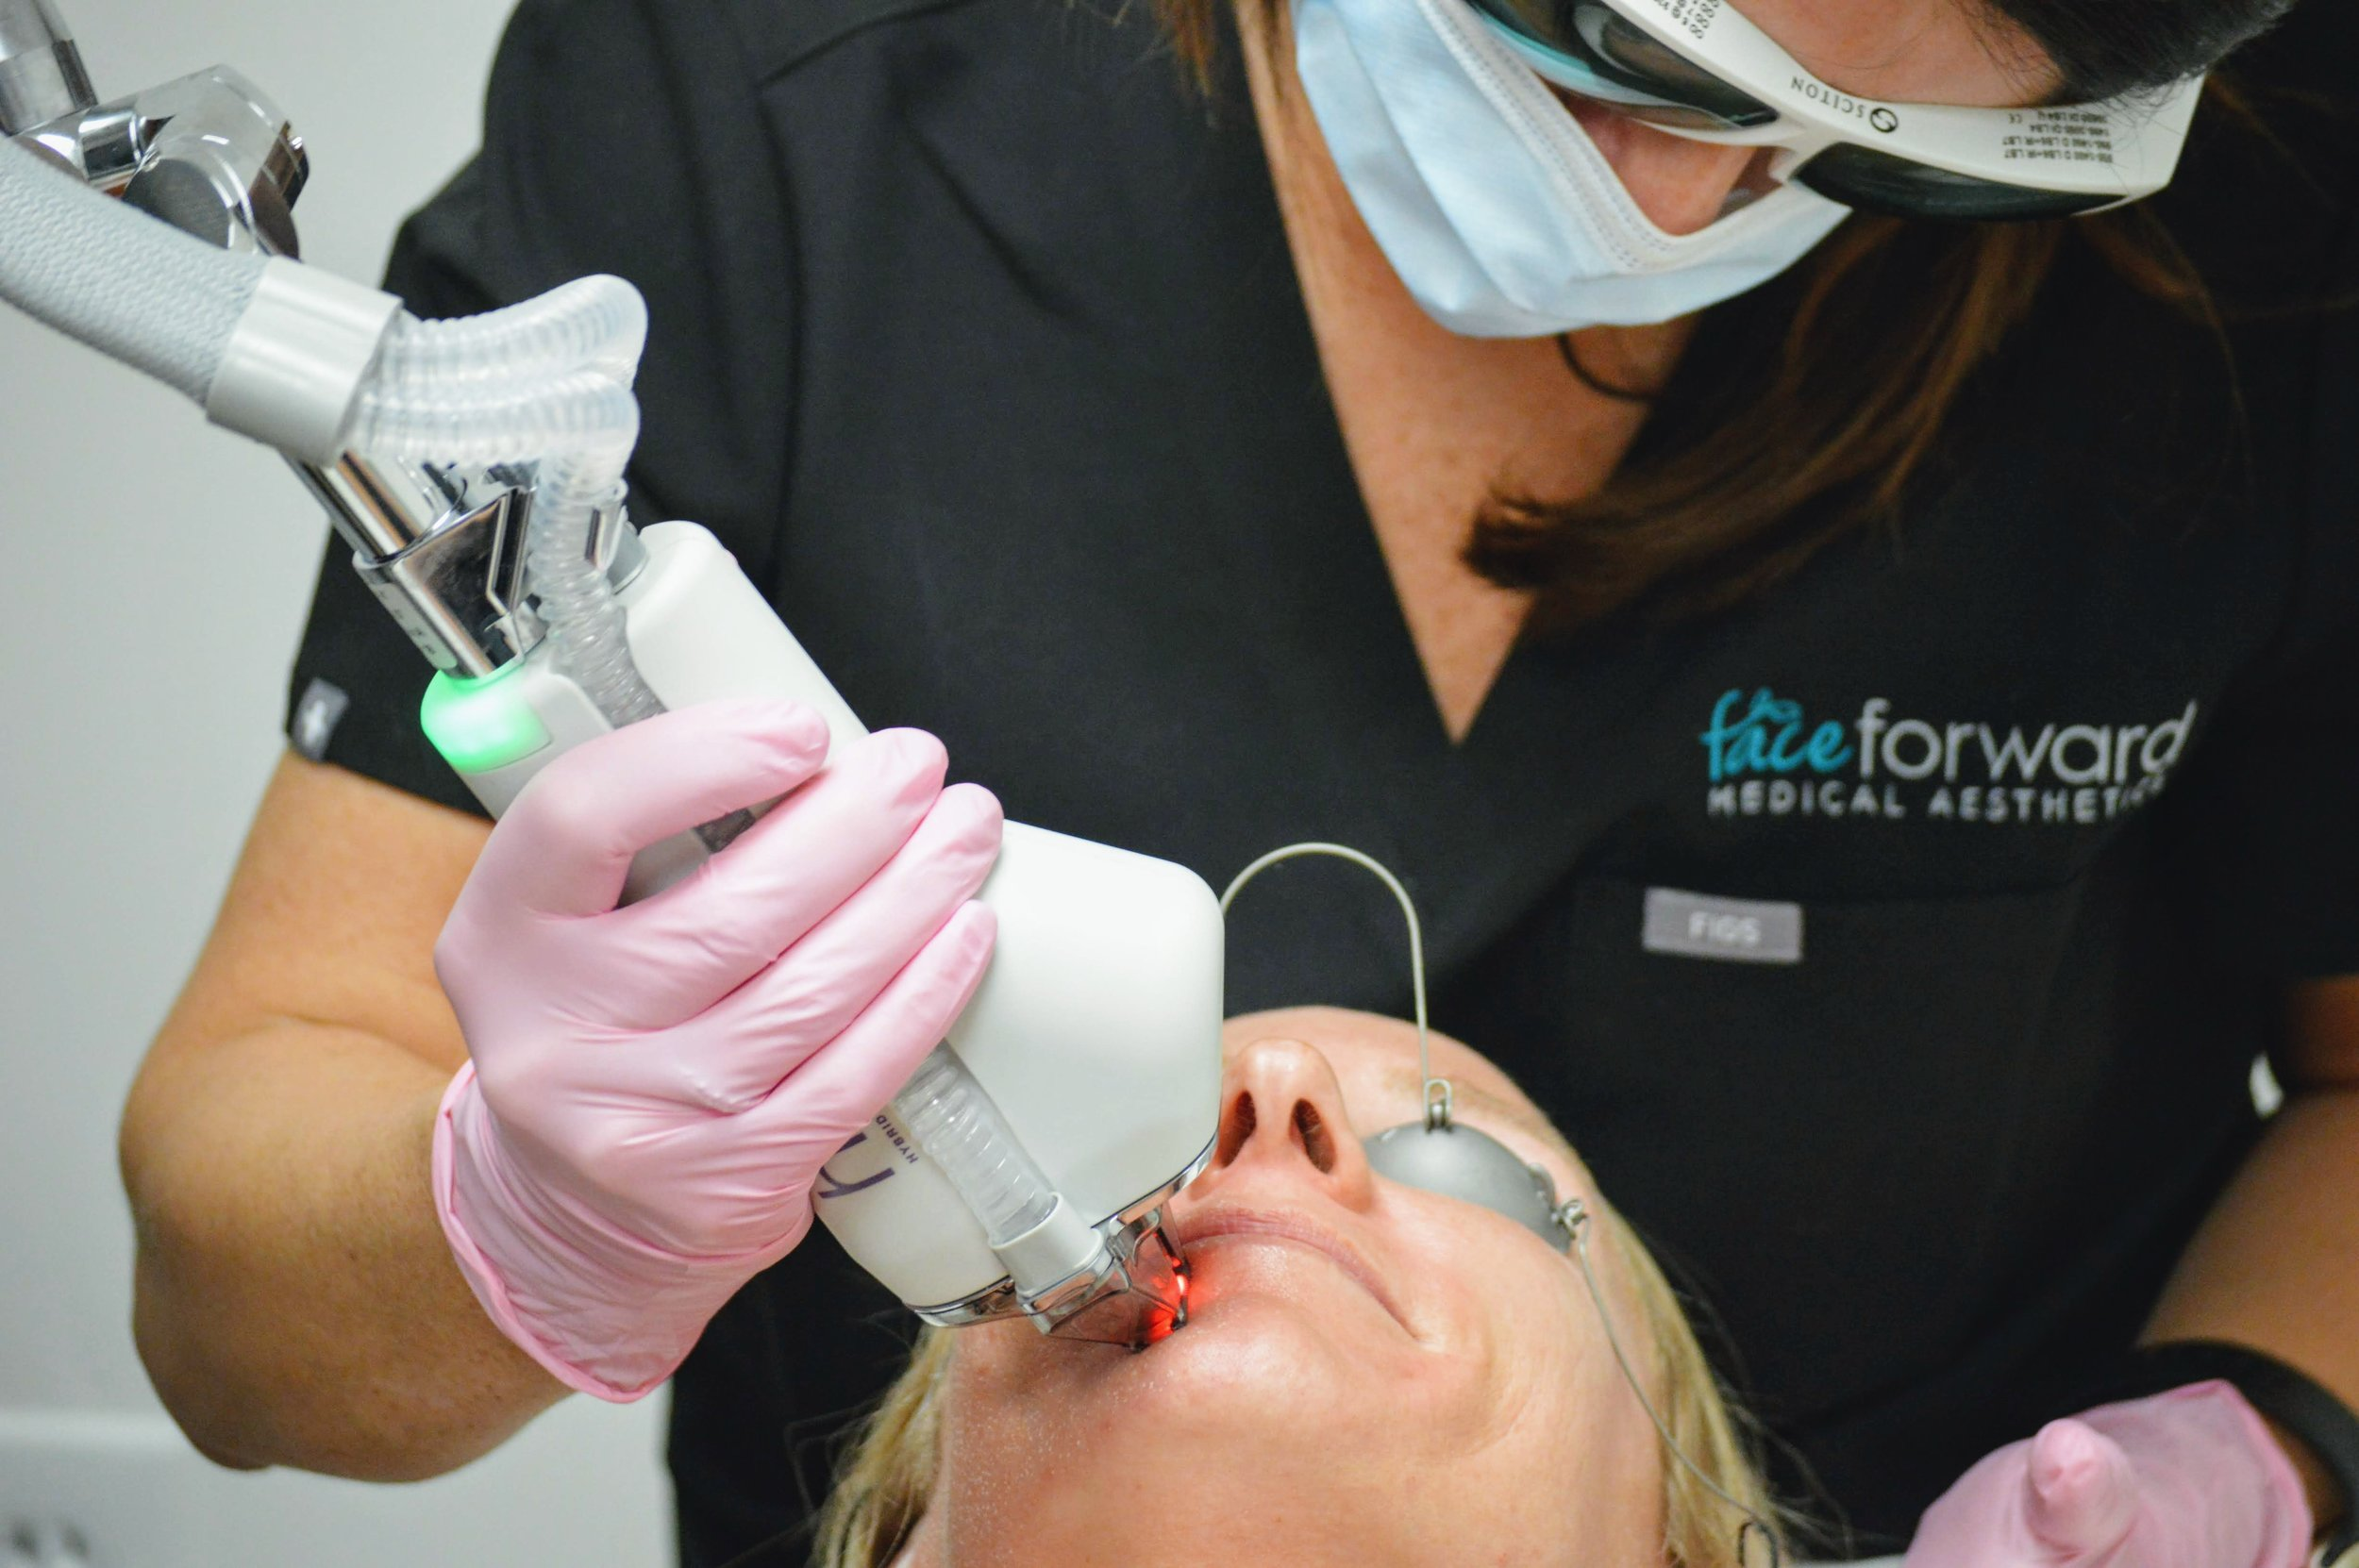 Halo Laser skin rejuvenation in Lexington, MA